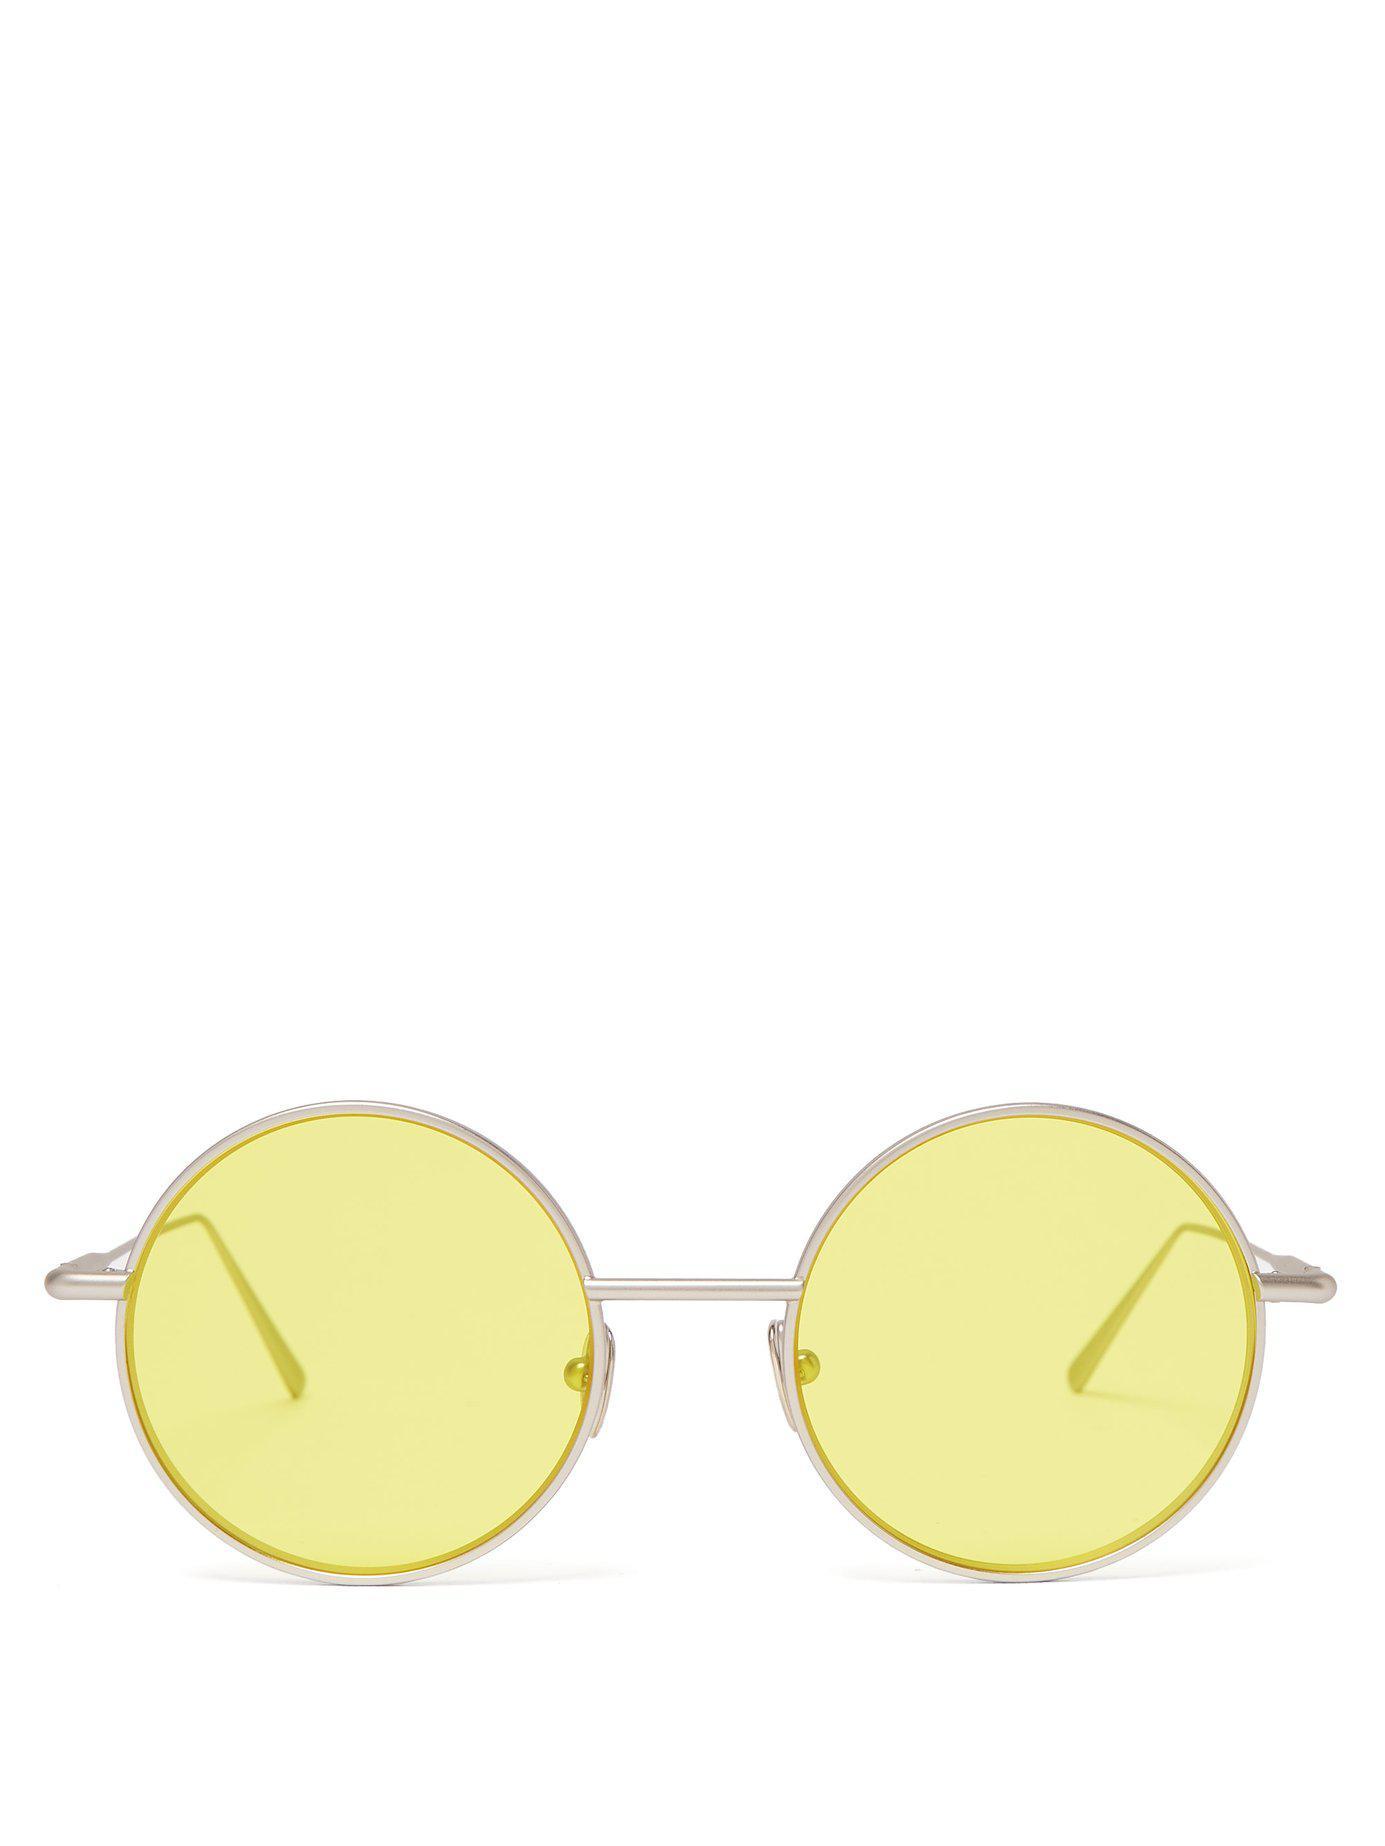 9a0555c28568 Lyst - Acne Studios Scientist Round Metal Sunglasses in Yellow